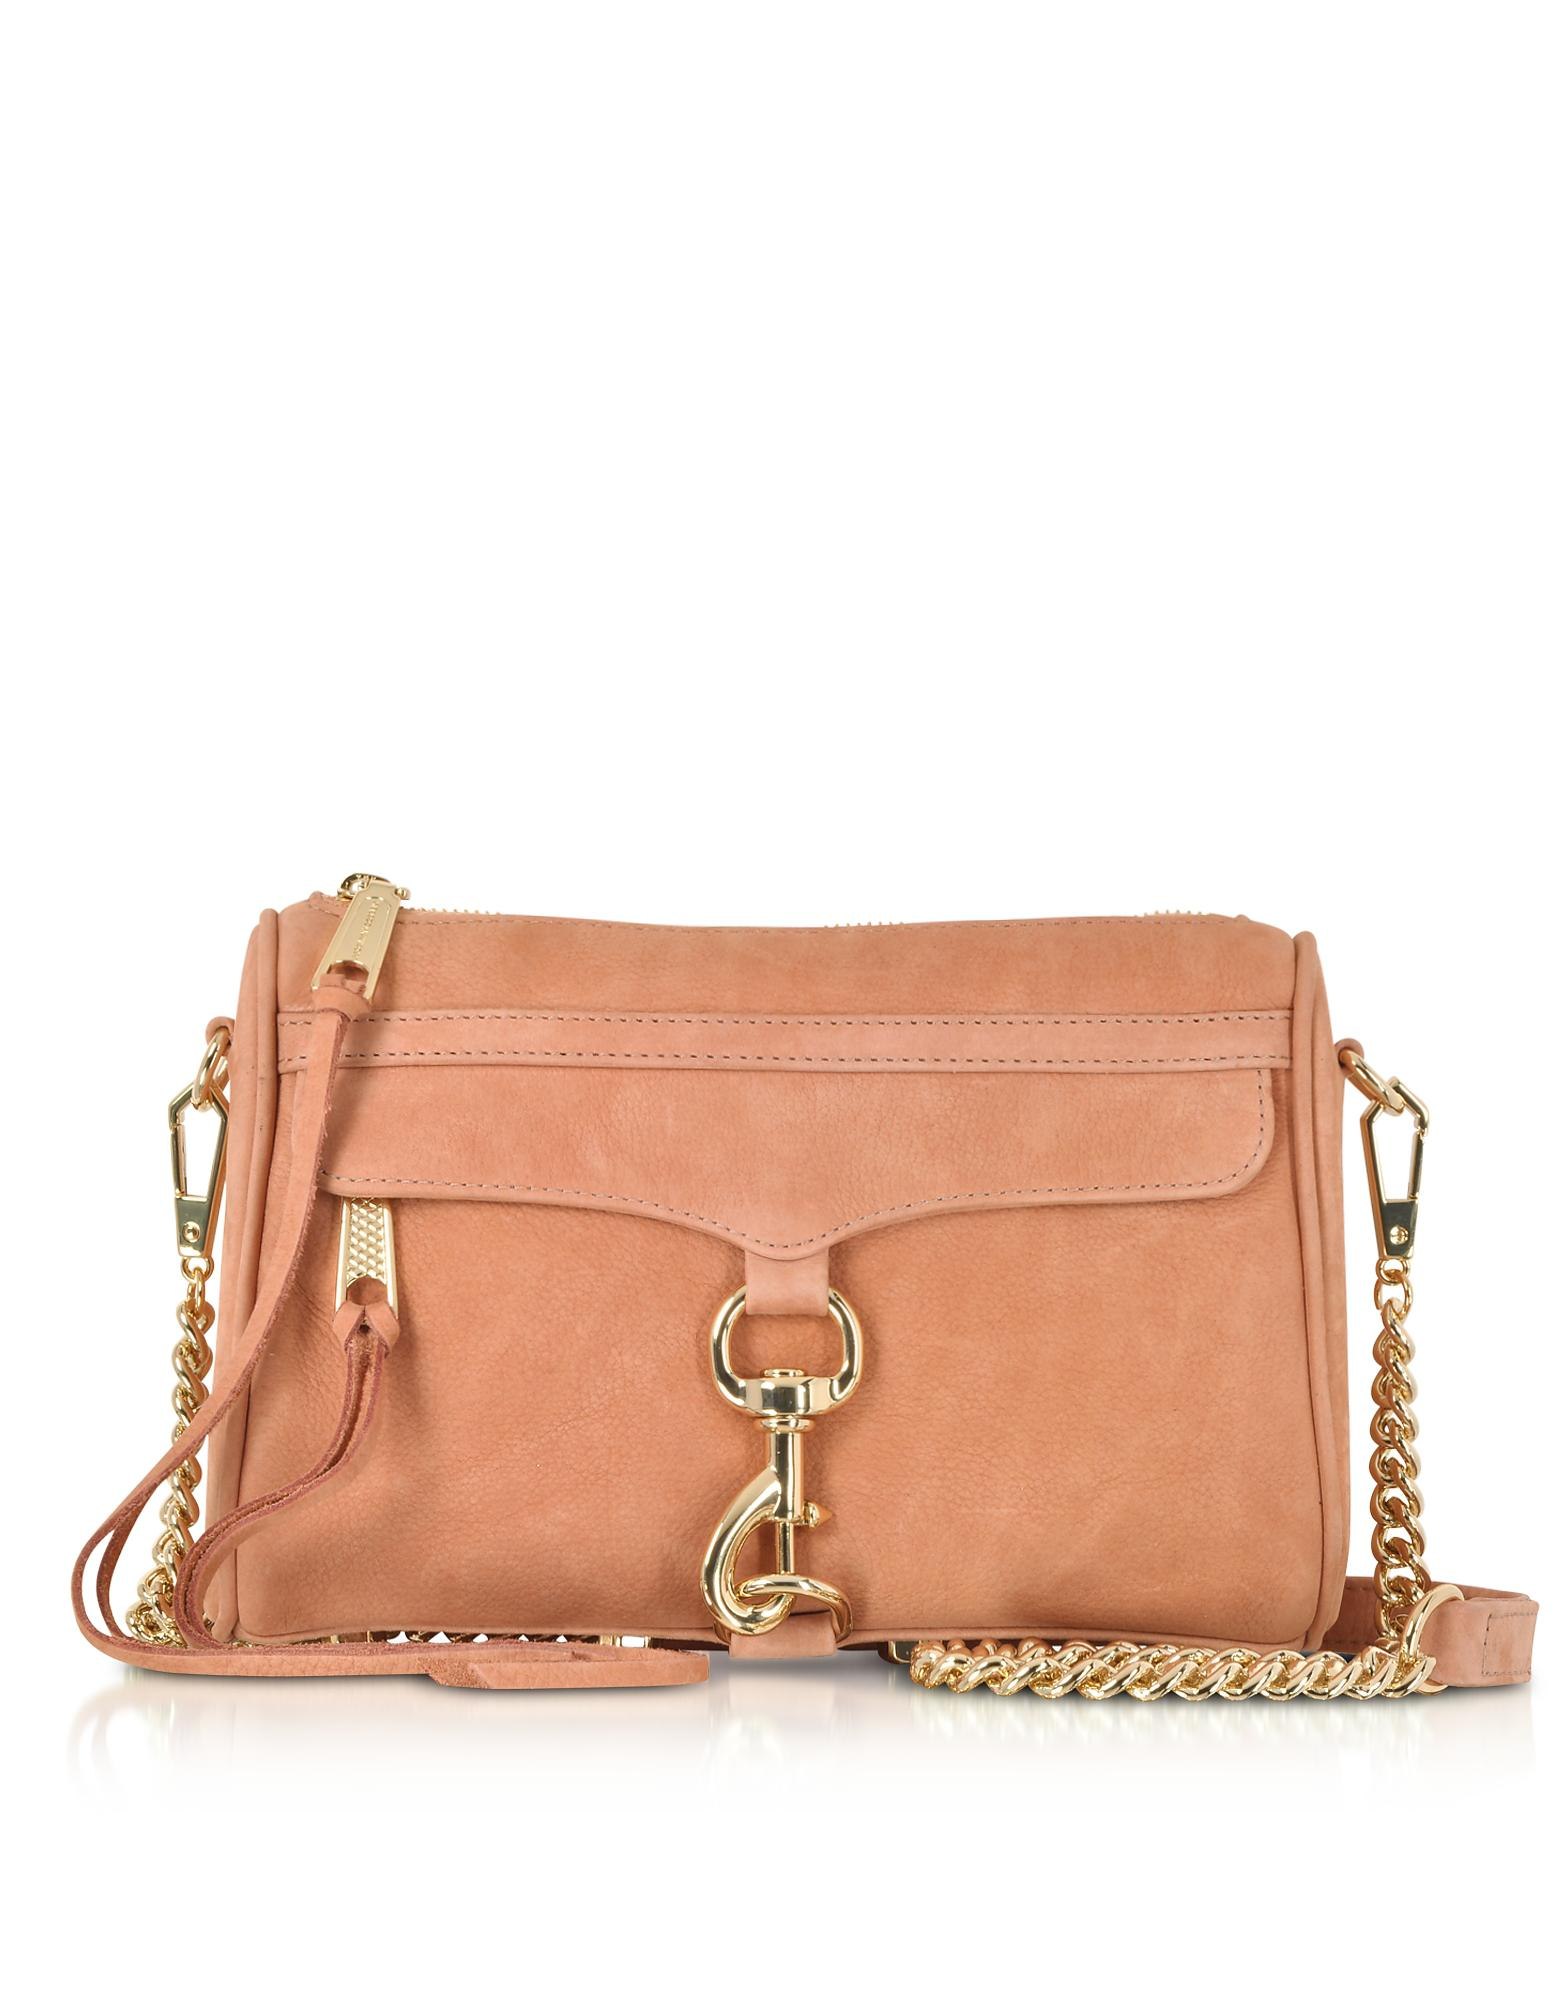 Rebecca Minkoff. Women s Brown Dusty Peach Leather Mini M.a.c. Crossbody Bag 3243680f281a4